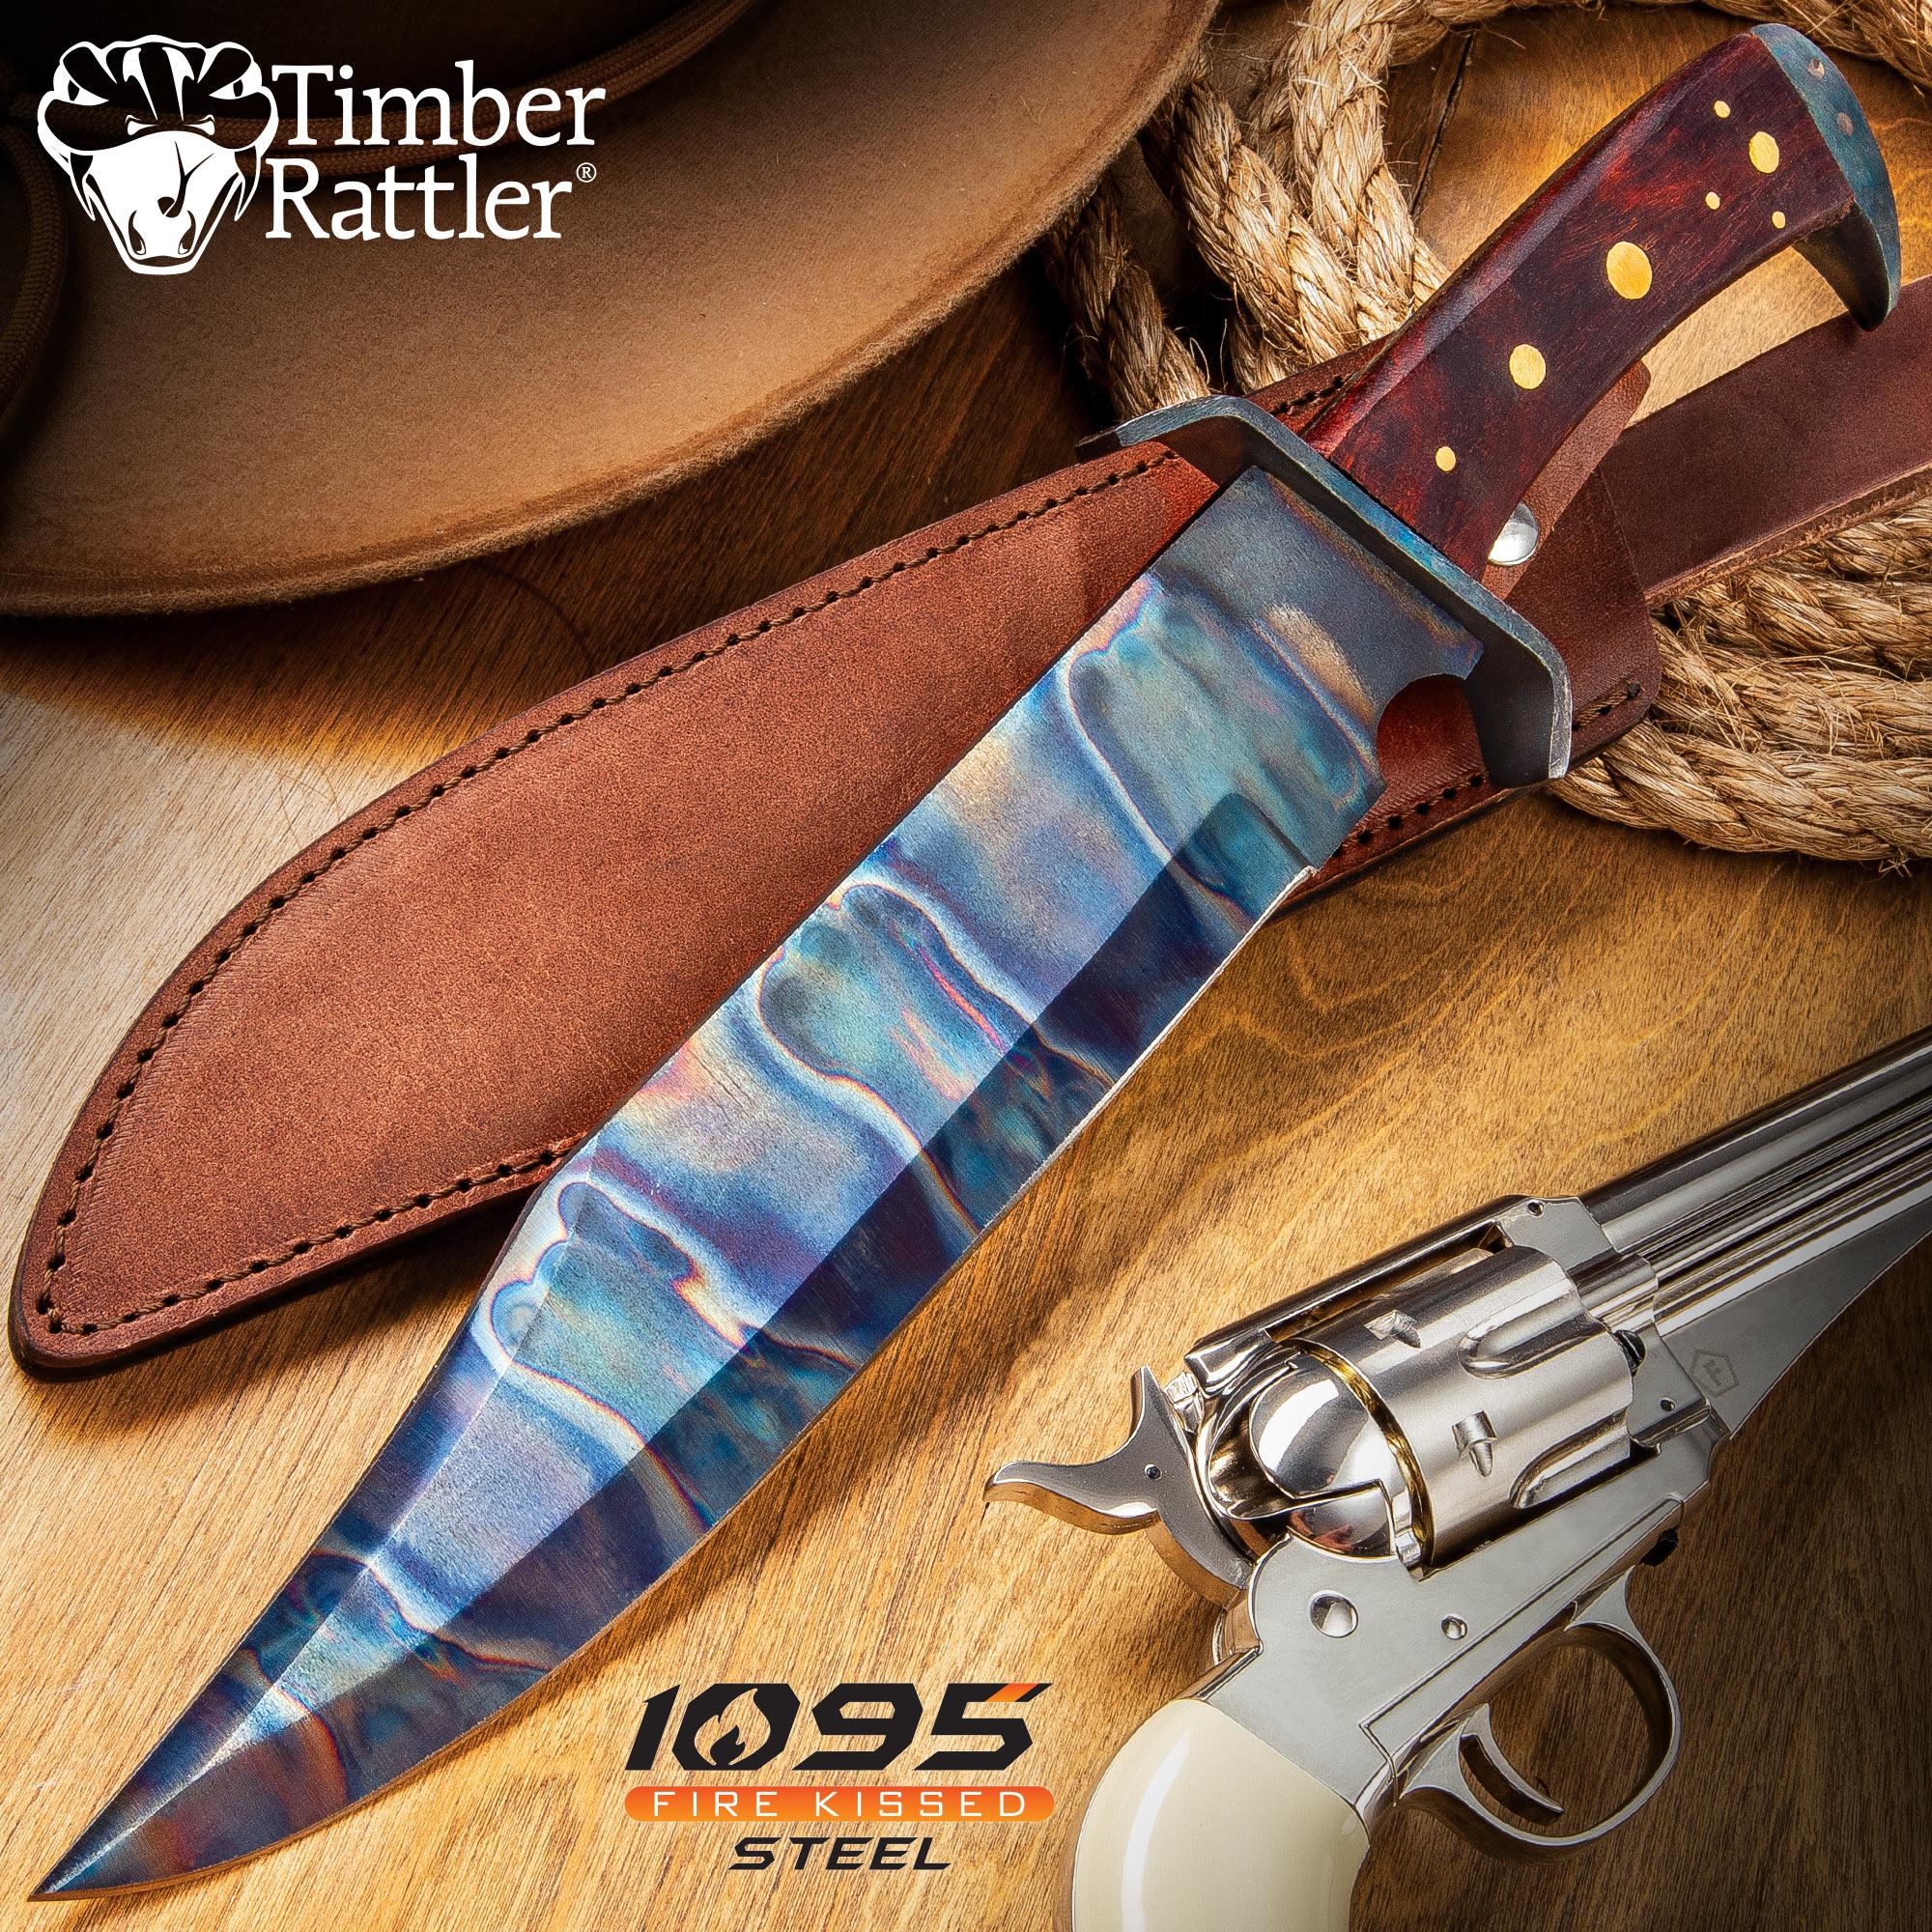 Timber Rattler Gunslinger Bowie Knife With Sheath - 1095